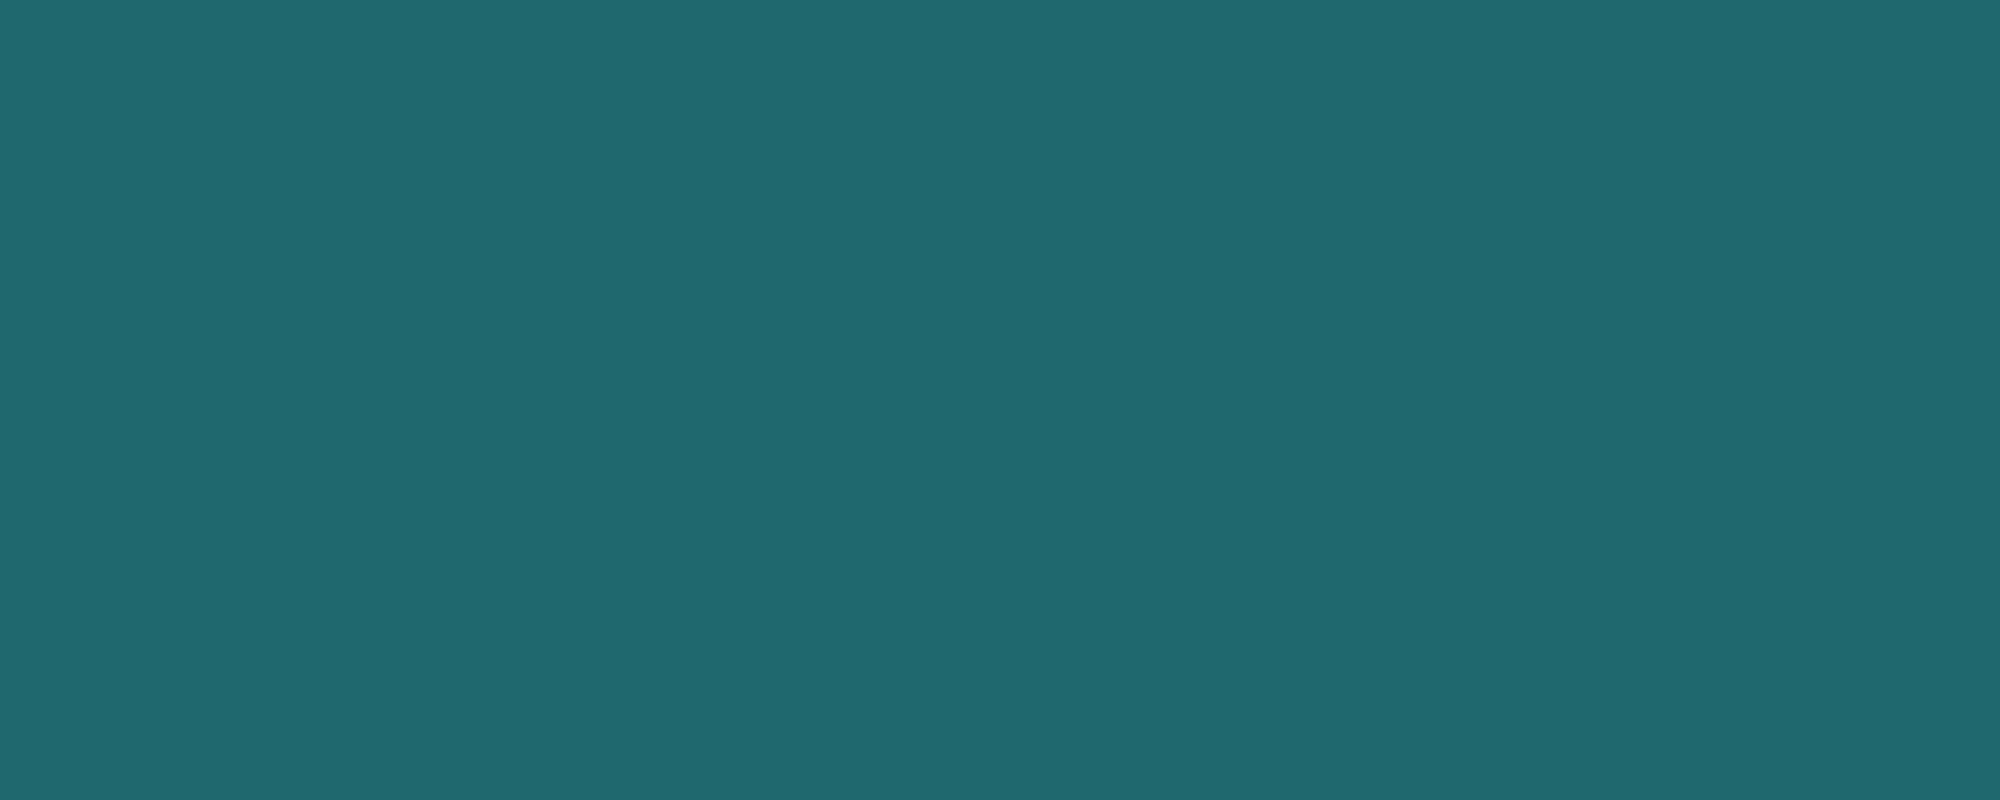 groen_mantelzorgers